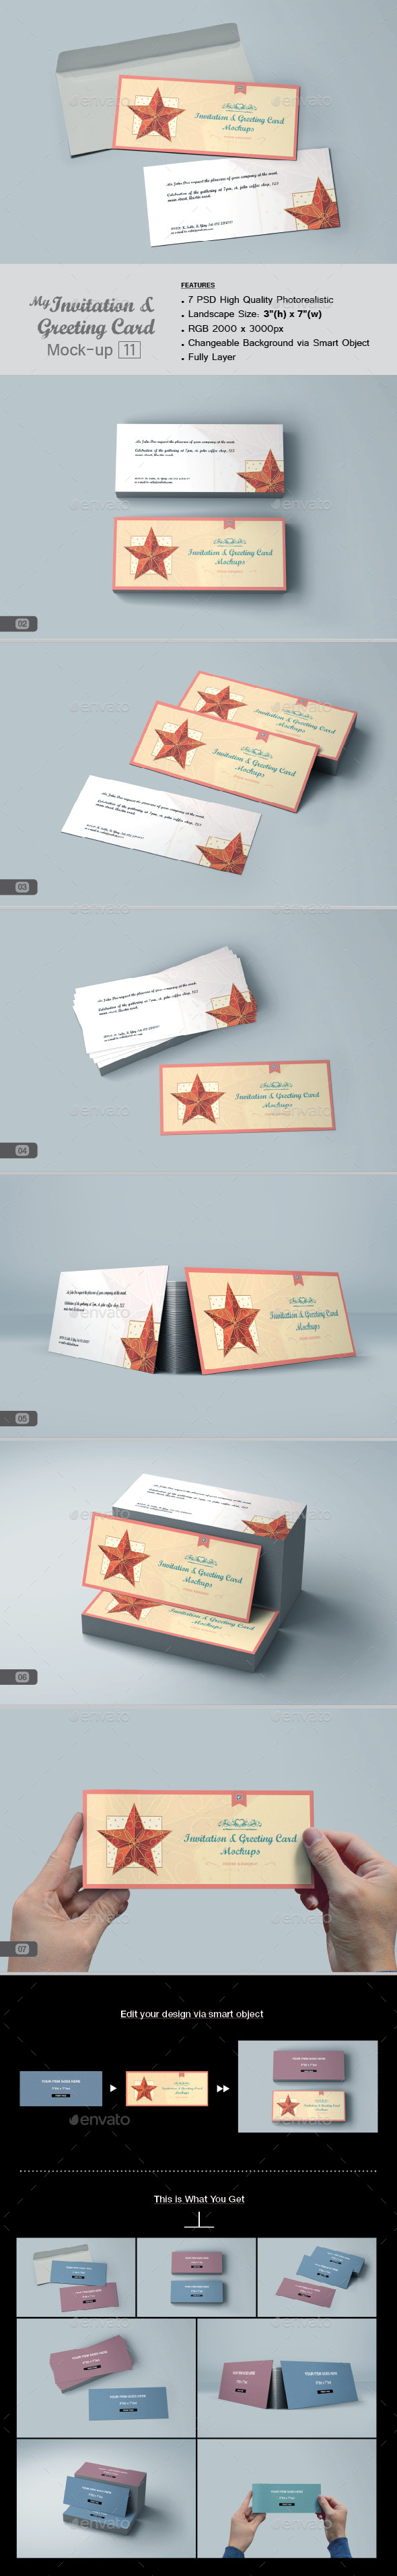 GraphicRiver myGreeting Card Mock-up v11 11780907